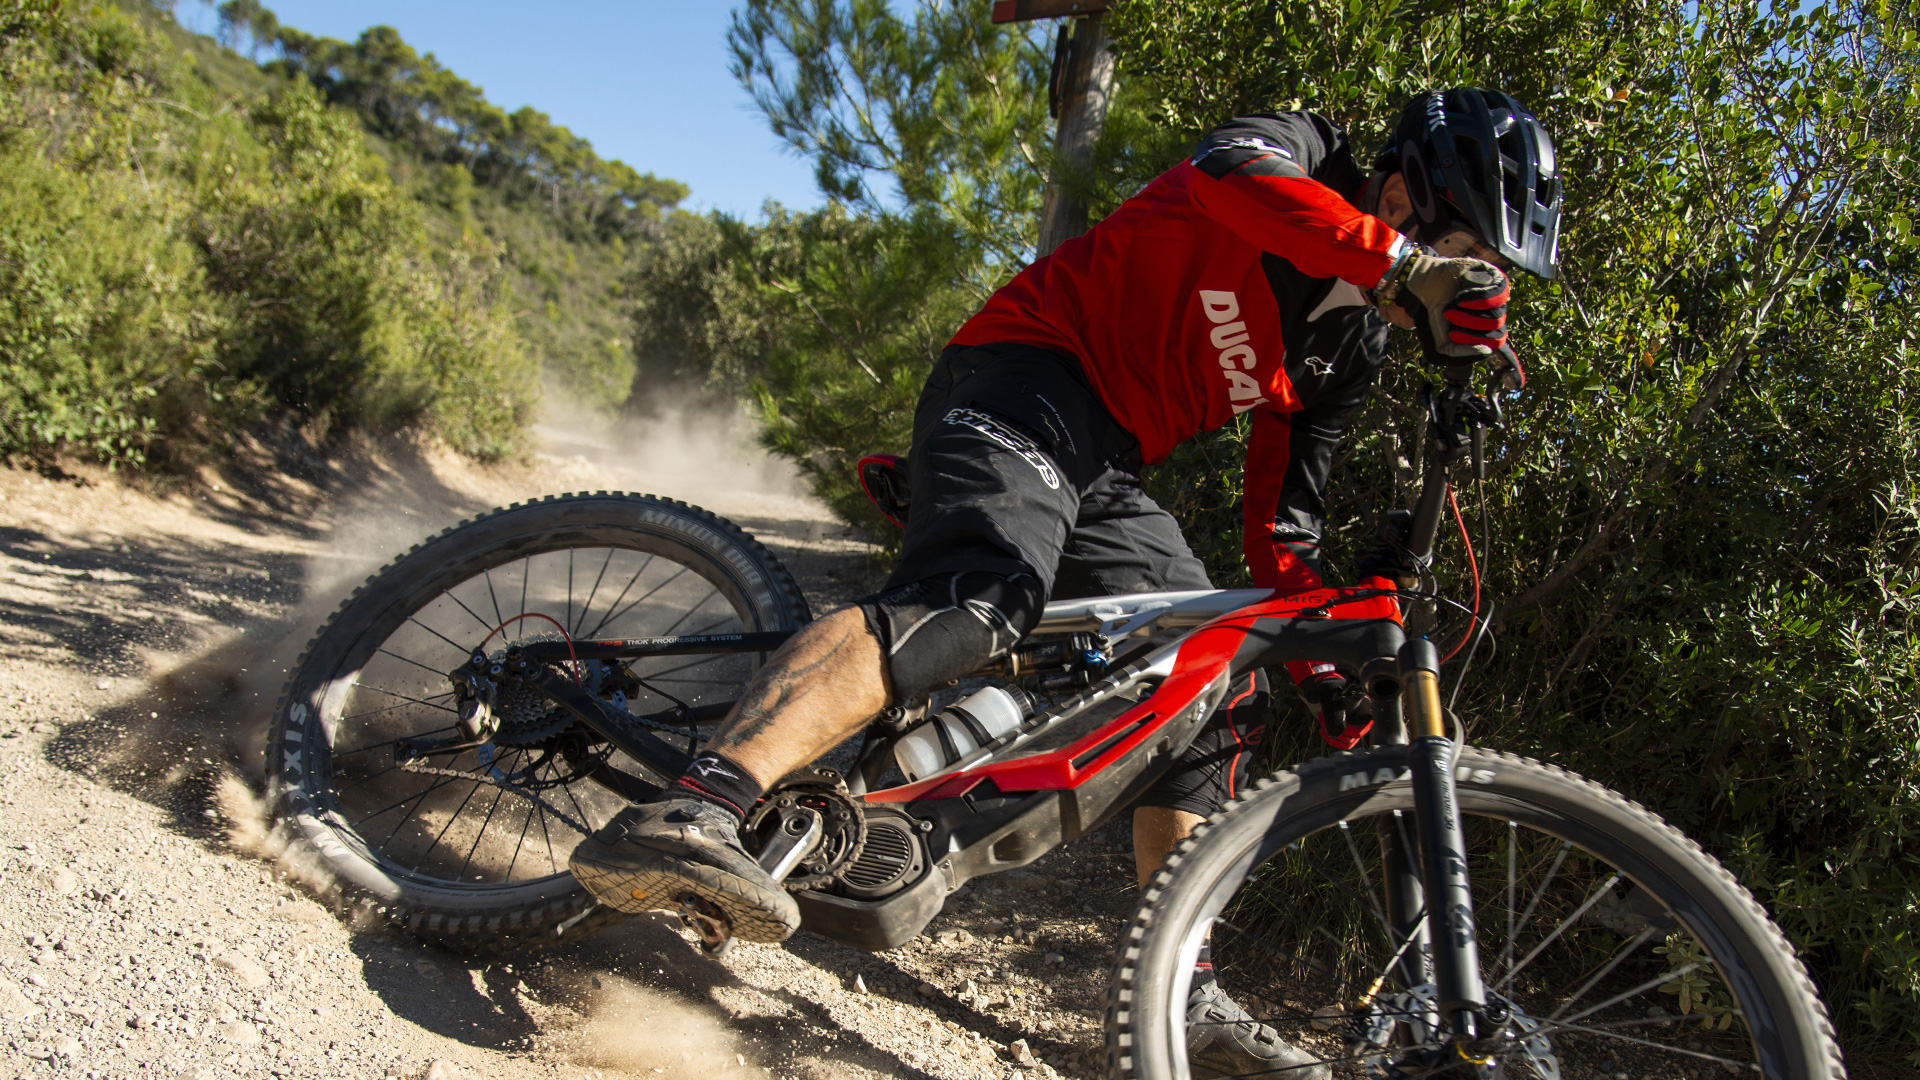 Ducati MIG-RR e-bike